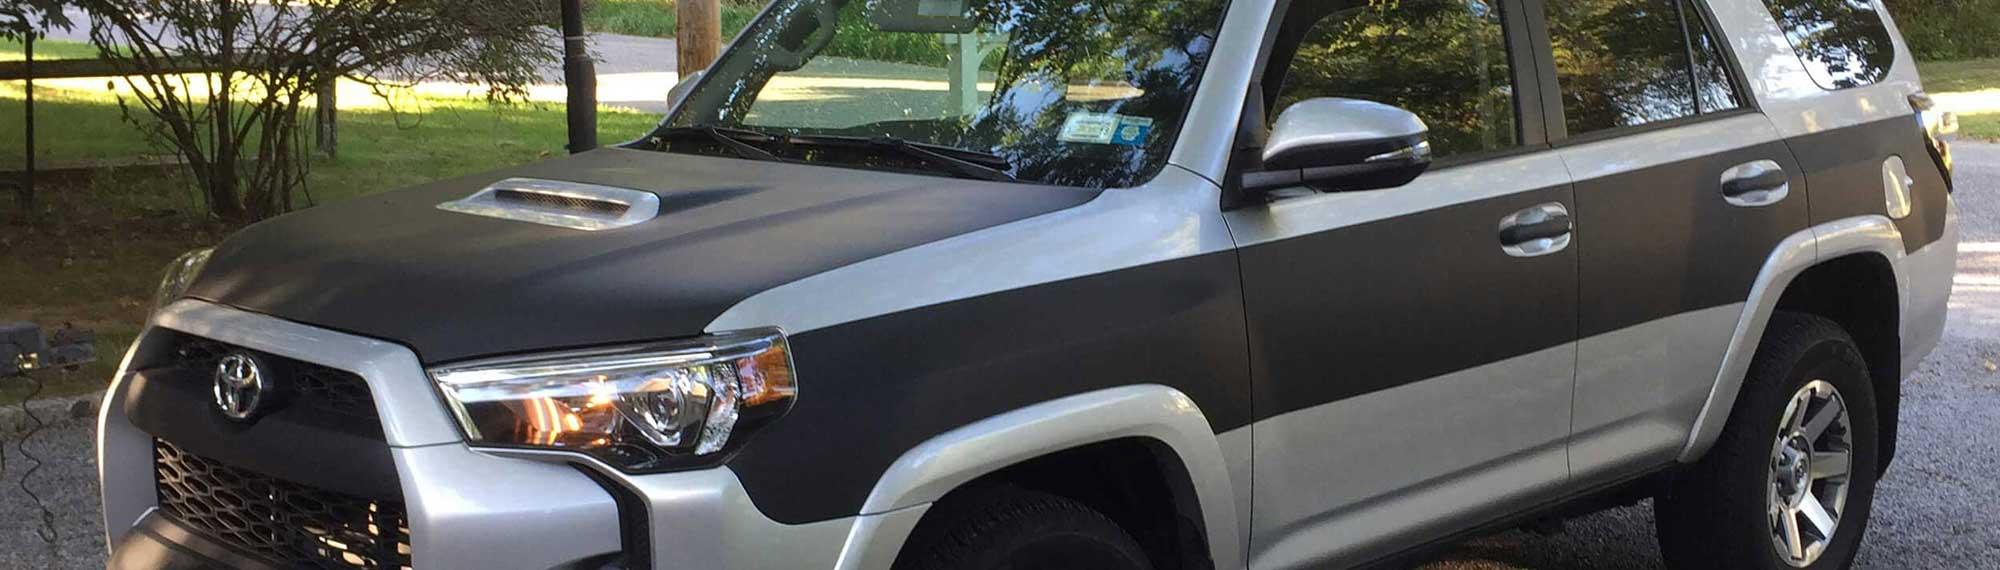 Truck Vinyl, Matte Black Vinyl